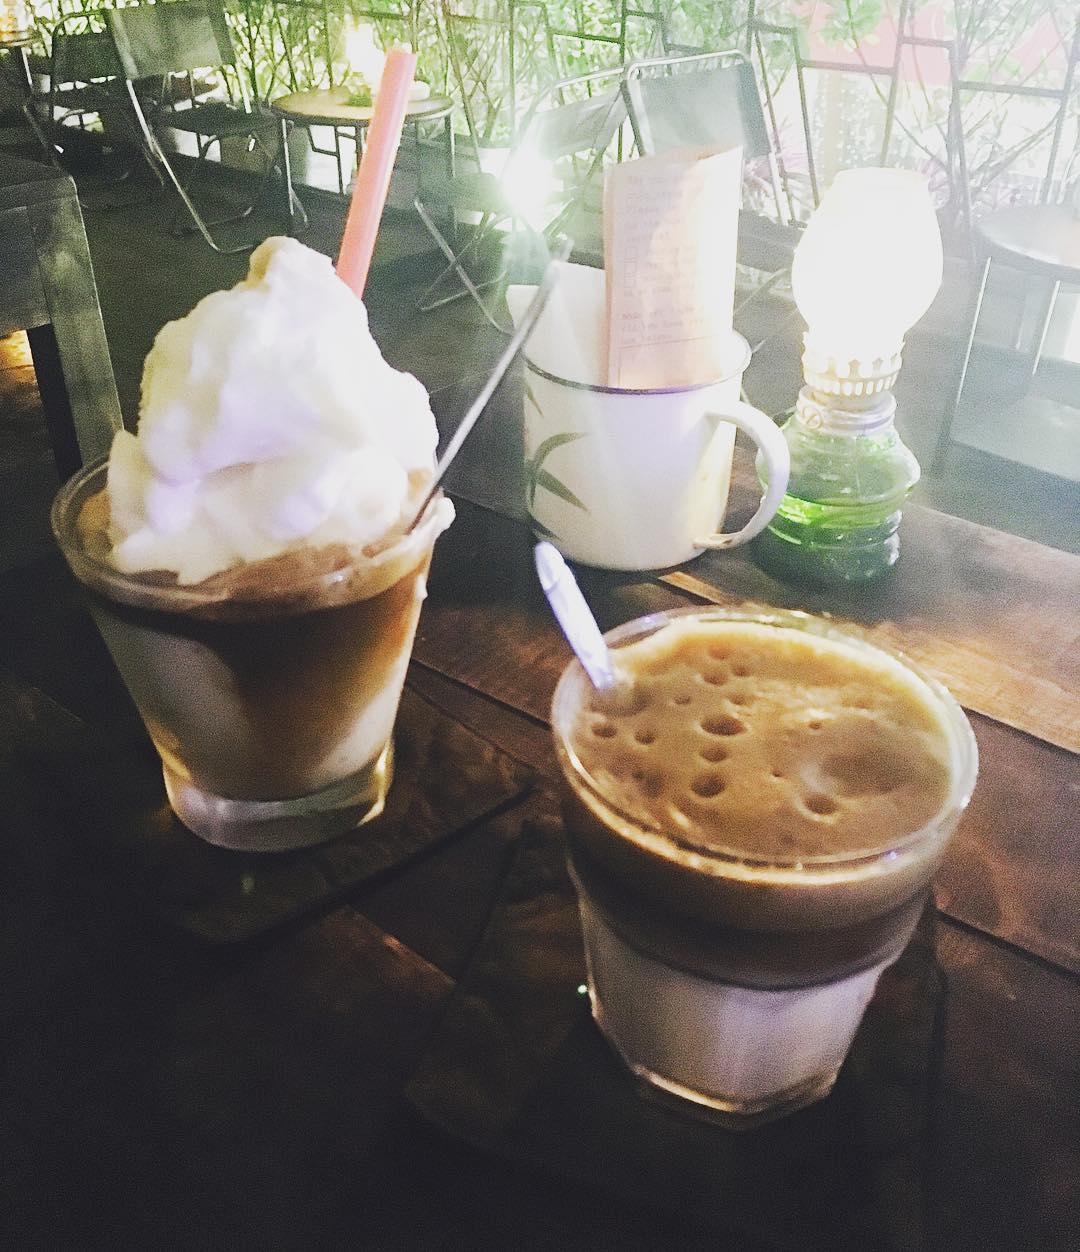 16123237 1814426415475640 1506385355878694912 n 베트남 하노이 취향저격 콩까페(cộngcafe) 코코넛 스무디 커피